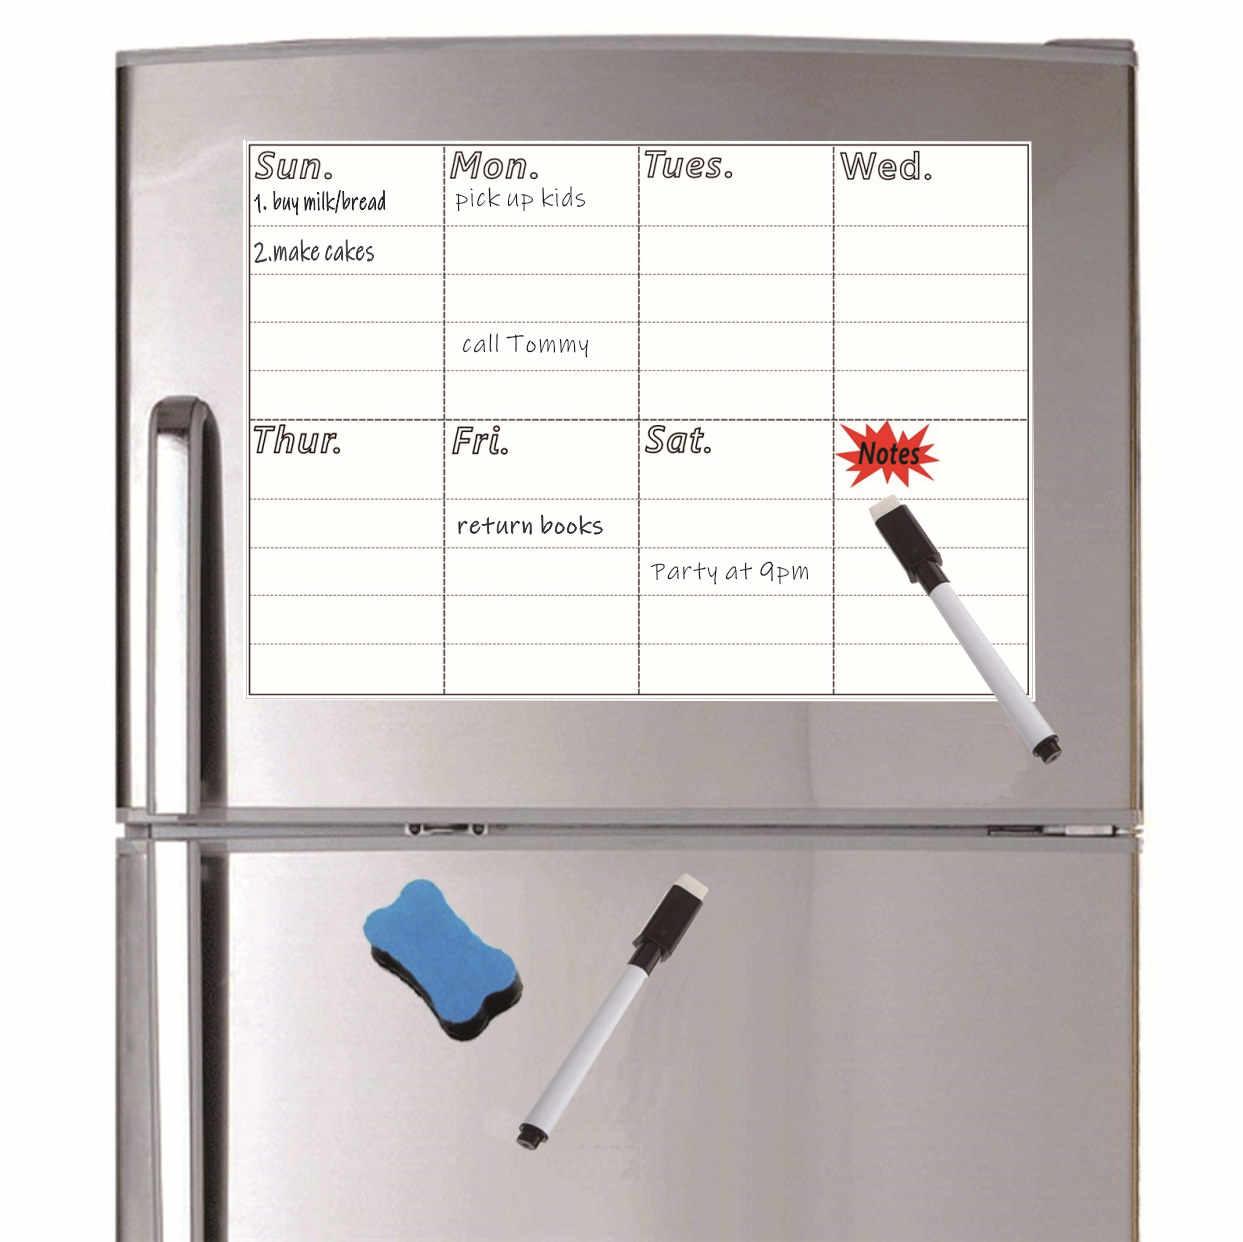 A4 Size Magnetische Wekelijkse Planner Board Droog VEEG Whiteboard Dag Planner Magneet Decor Schrijfbord Notepad Marker Gum